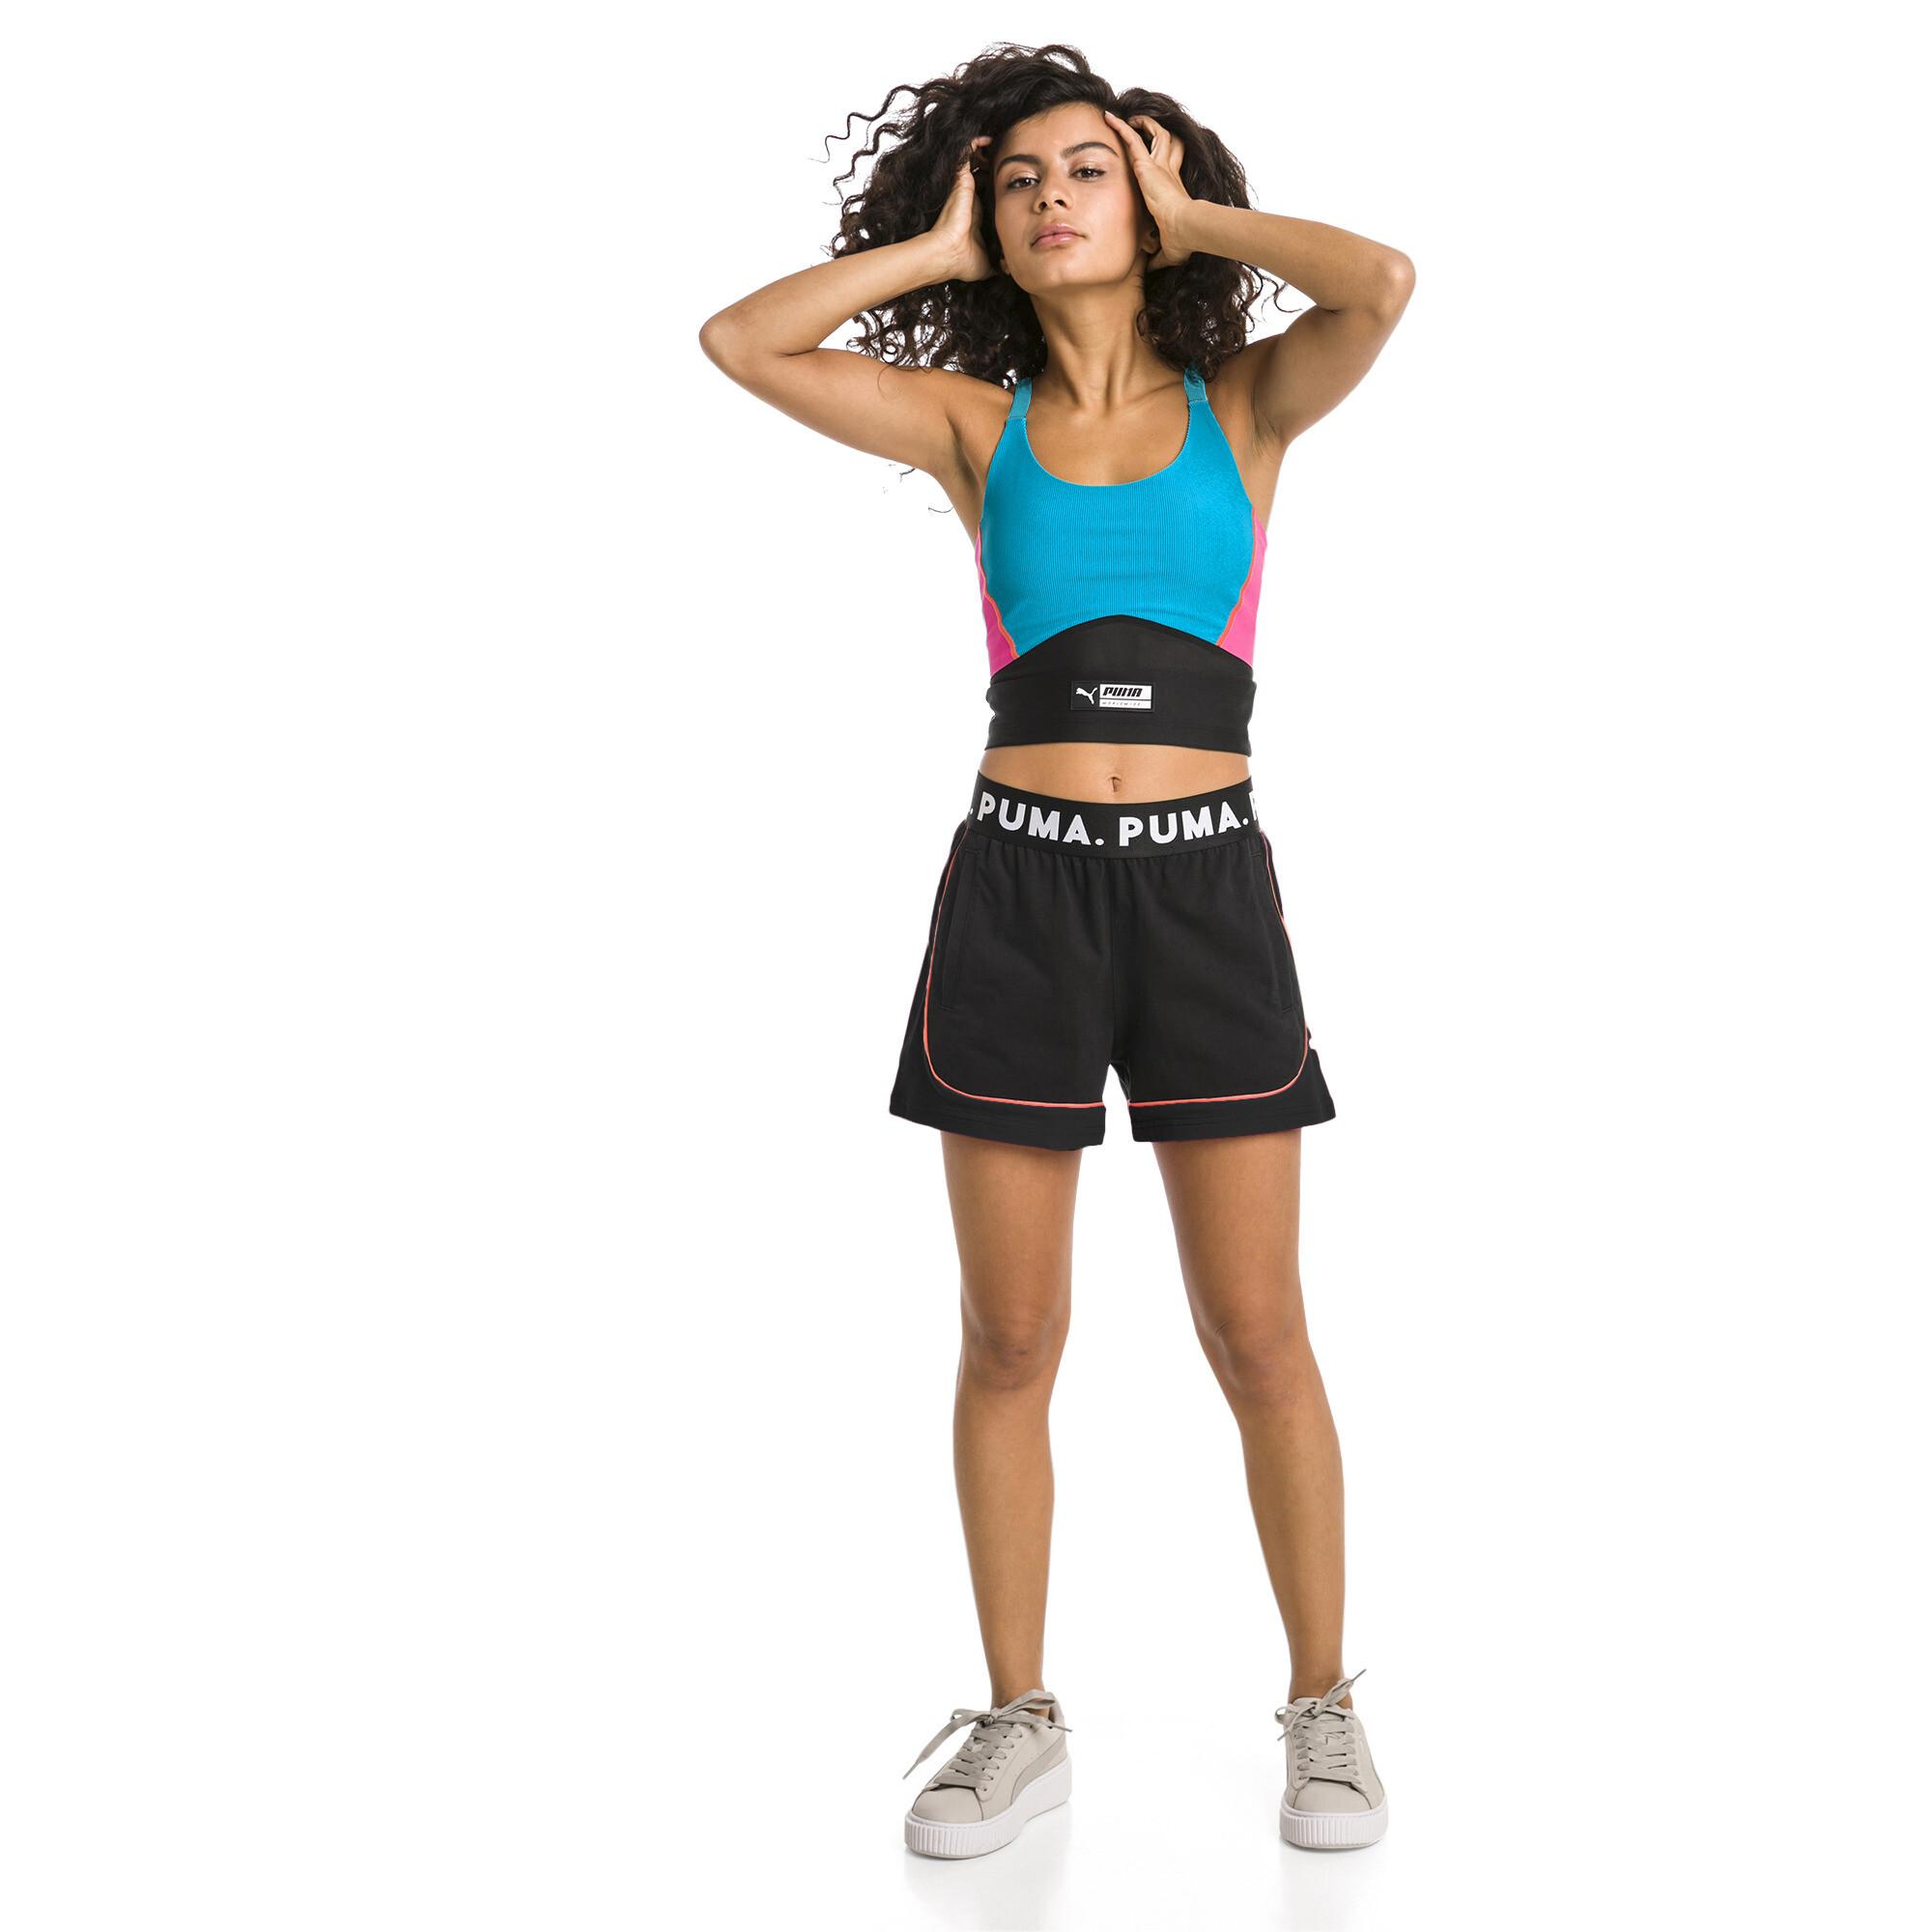 Image Puma TZ Women's Cropped Top #3